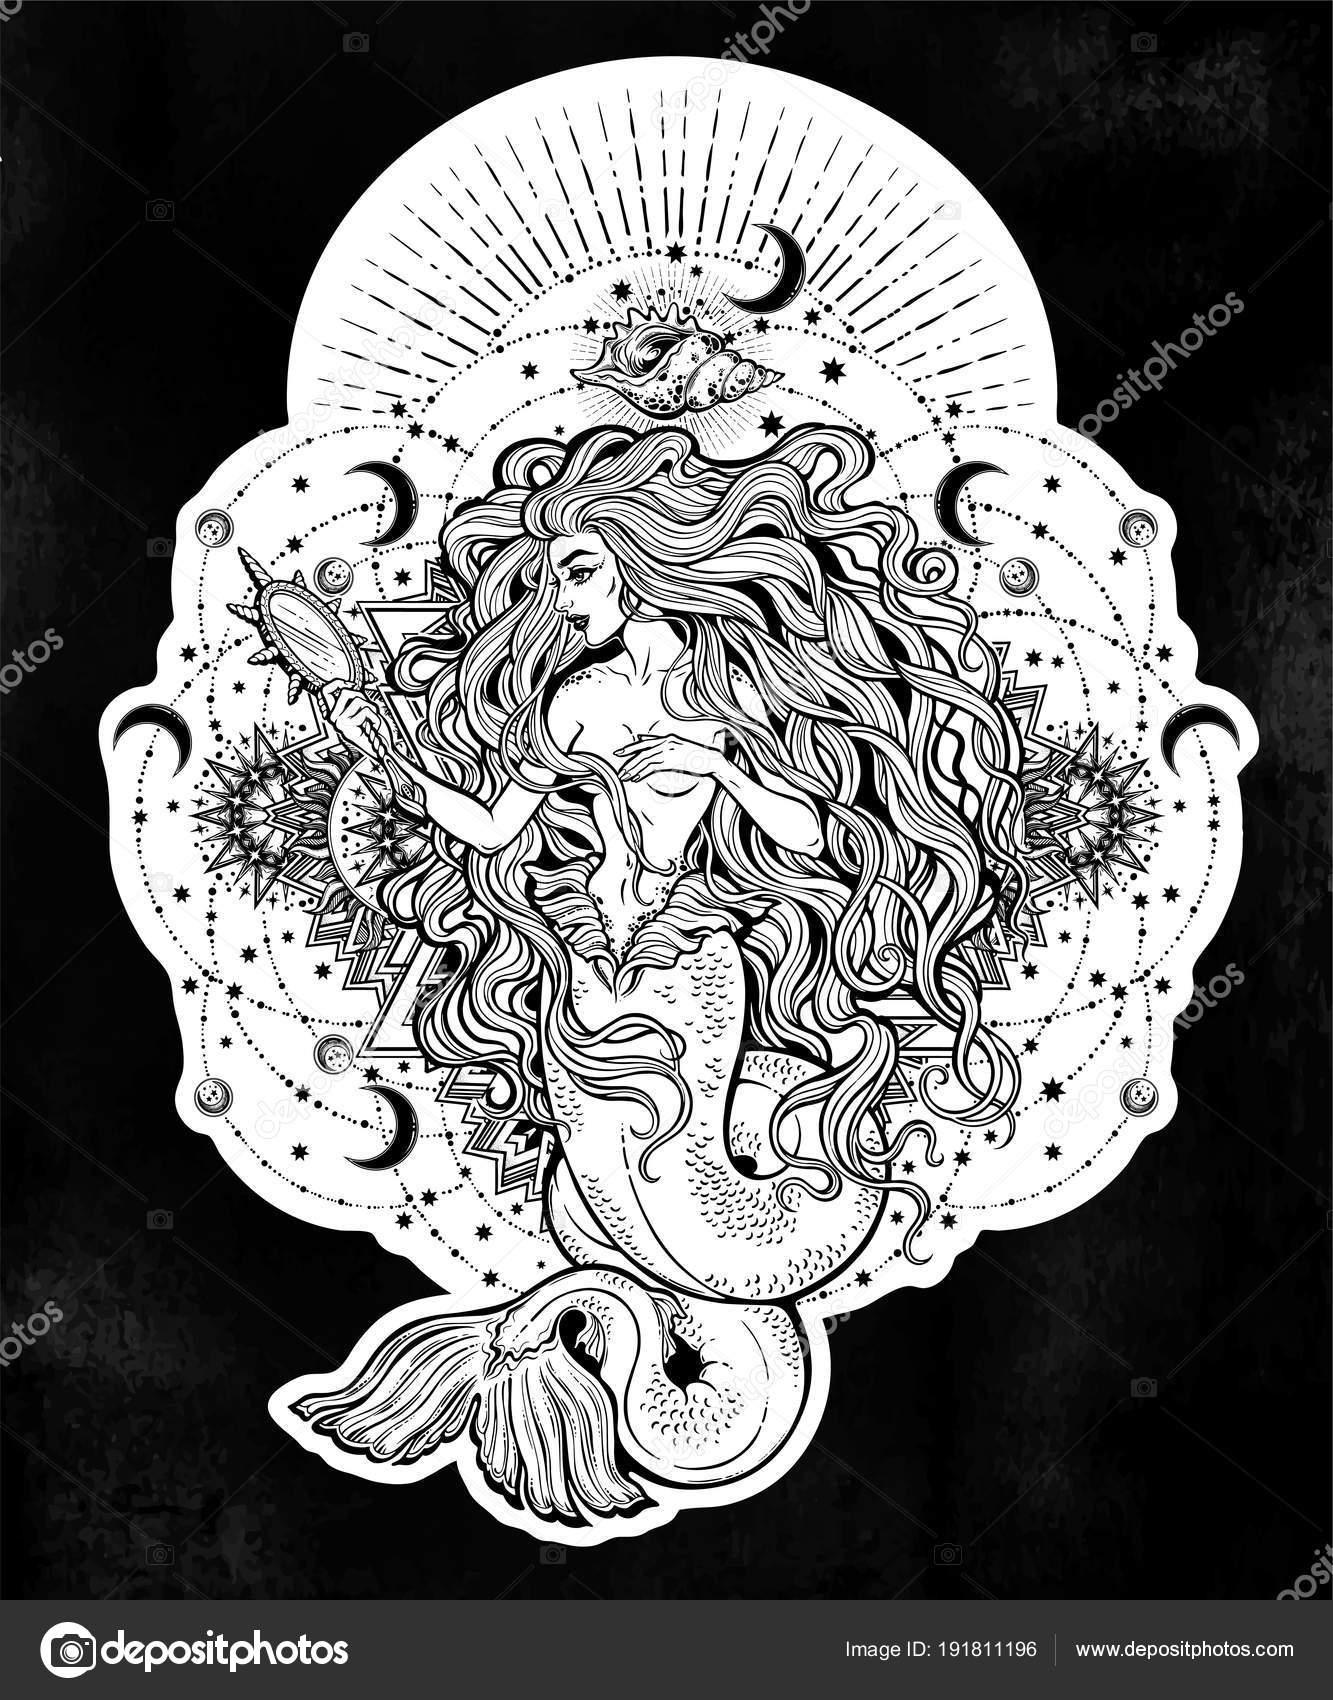 Mermaid girl with magic mirror in ornate mandala Stock Vector